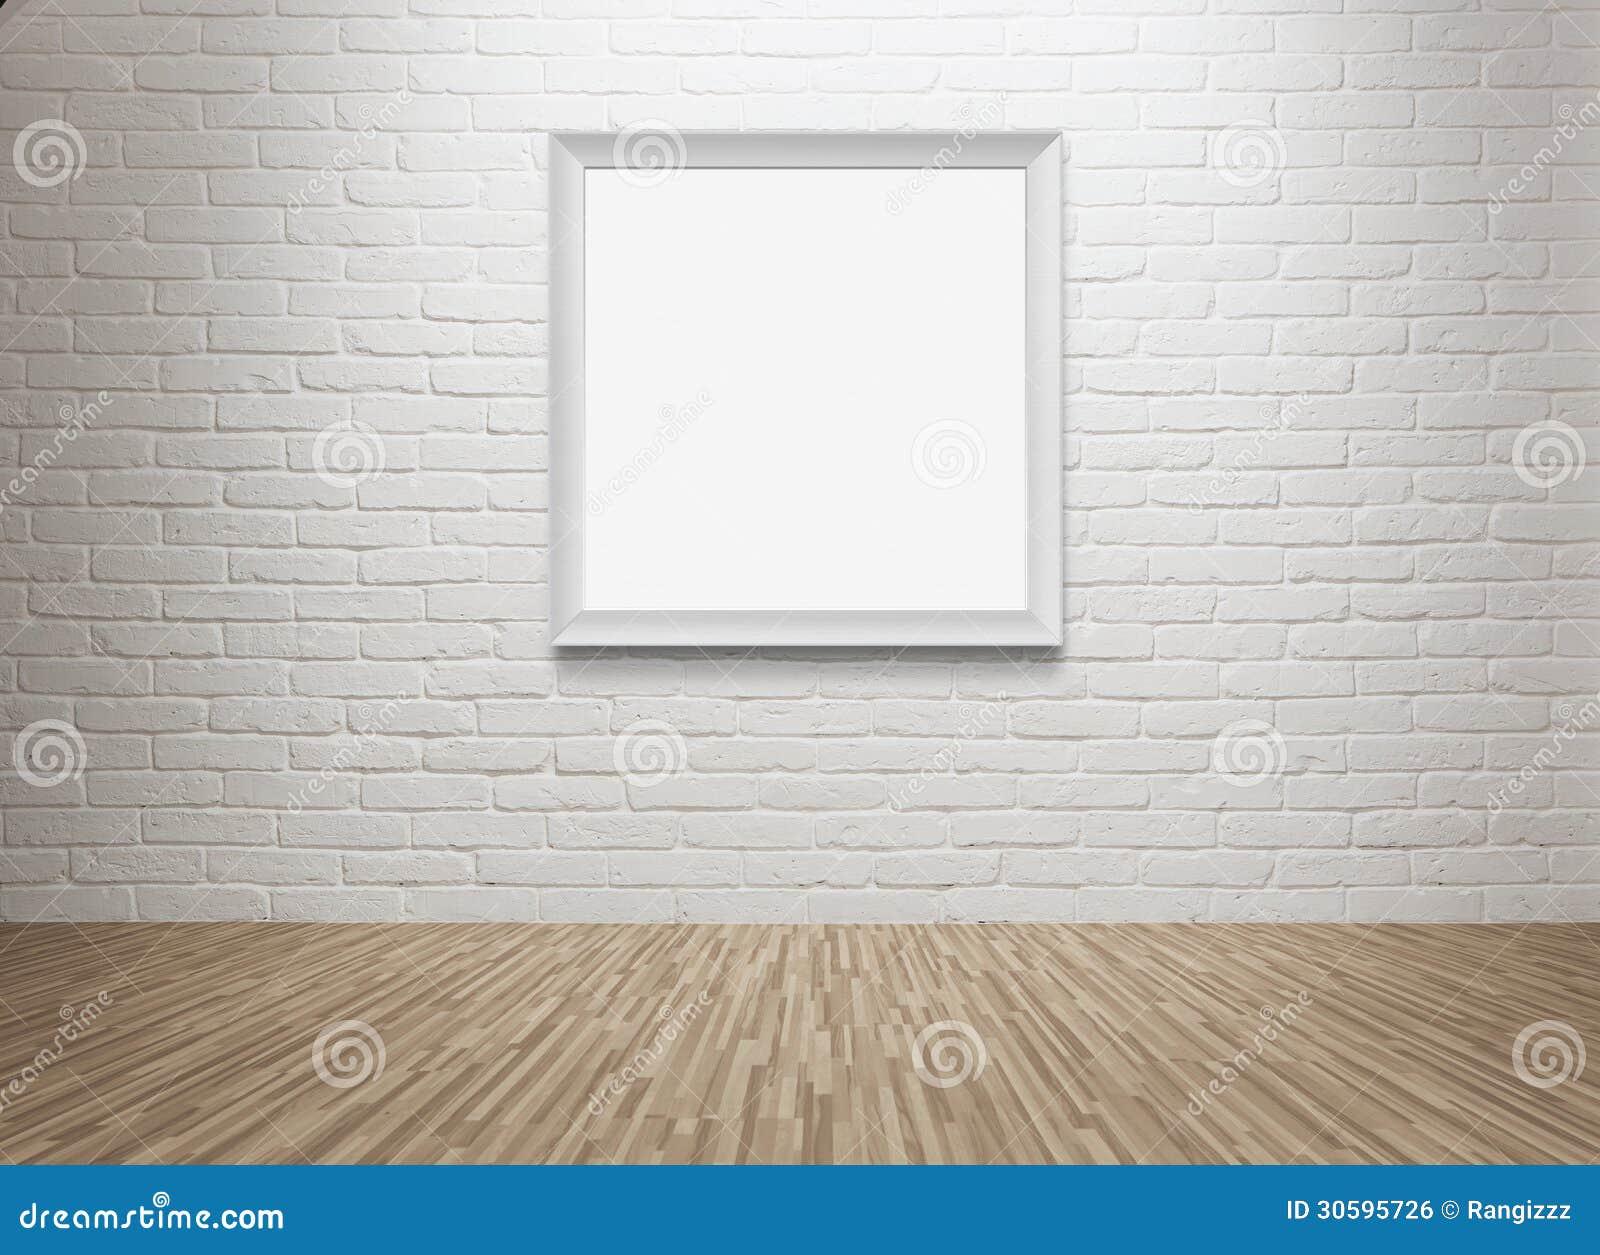 leerer bilderrahmen an der wand lizenzfreies stockbild image 30595726. Black Bedroom Furniture Sets. Home Design Ideas